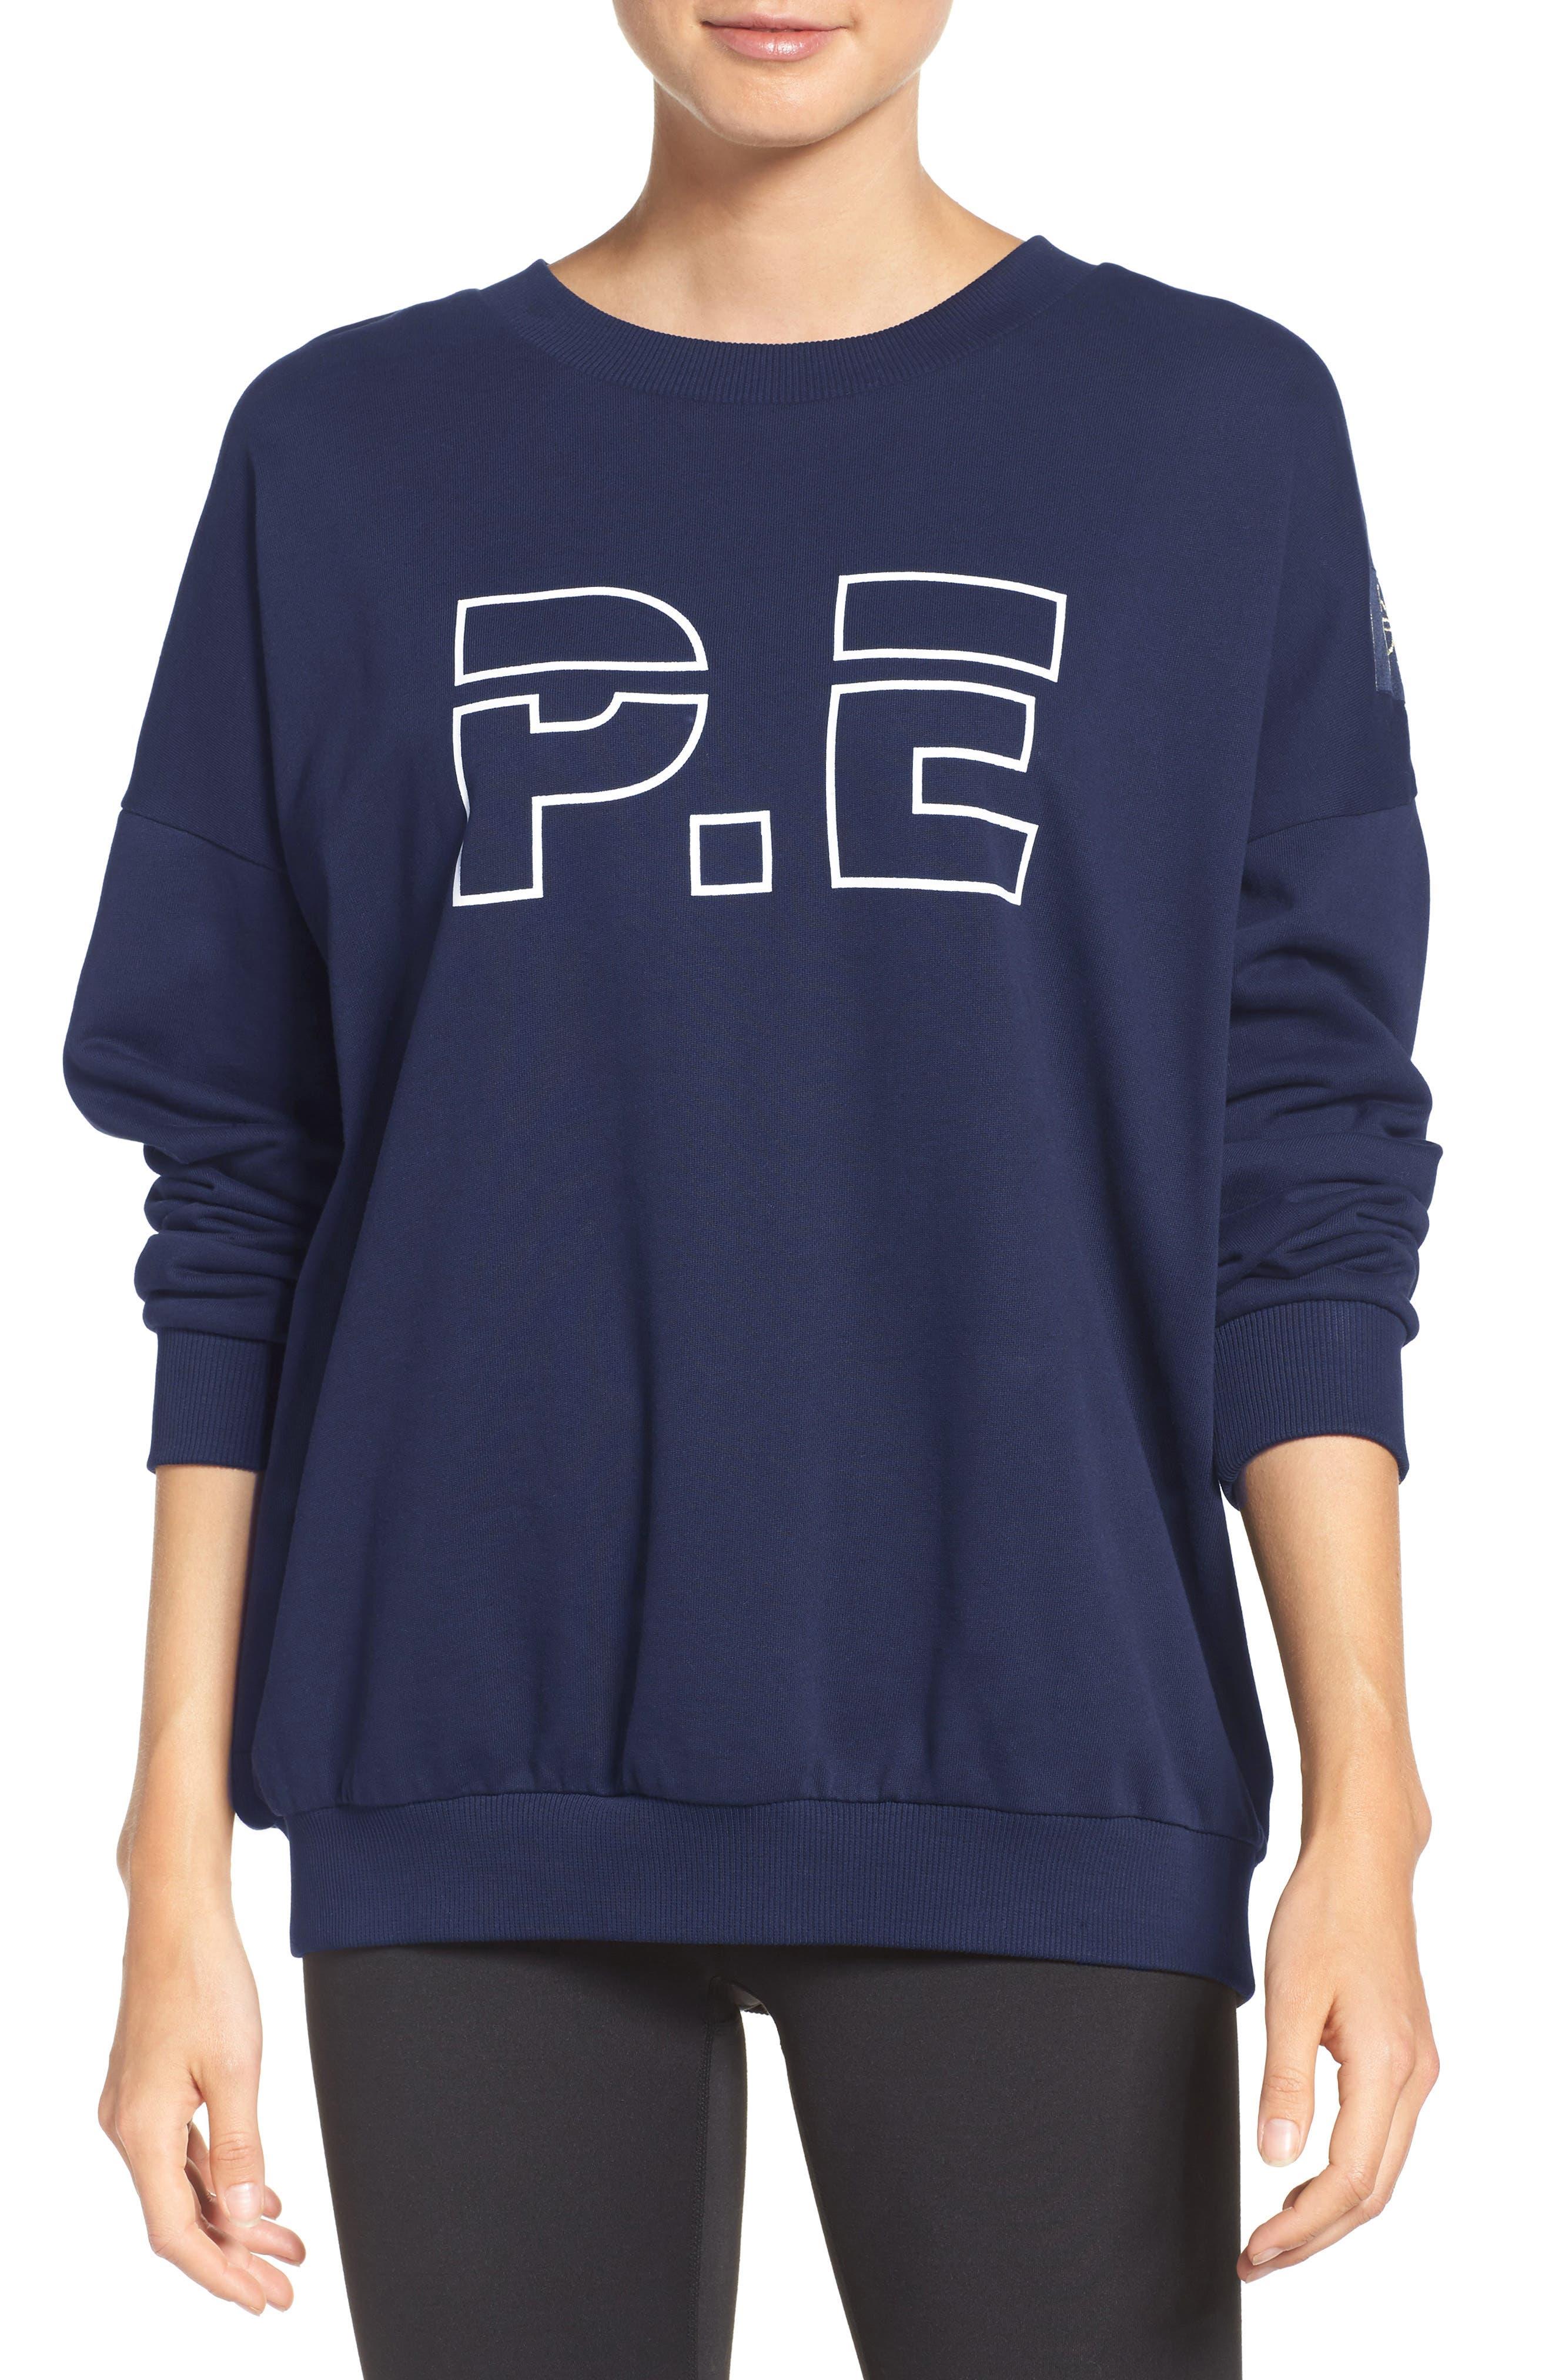 P.E. Nation The Heads Up Sweatshirt,                         Main,                         color, 410